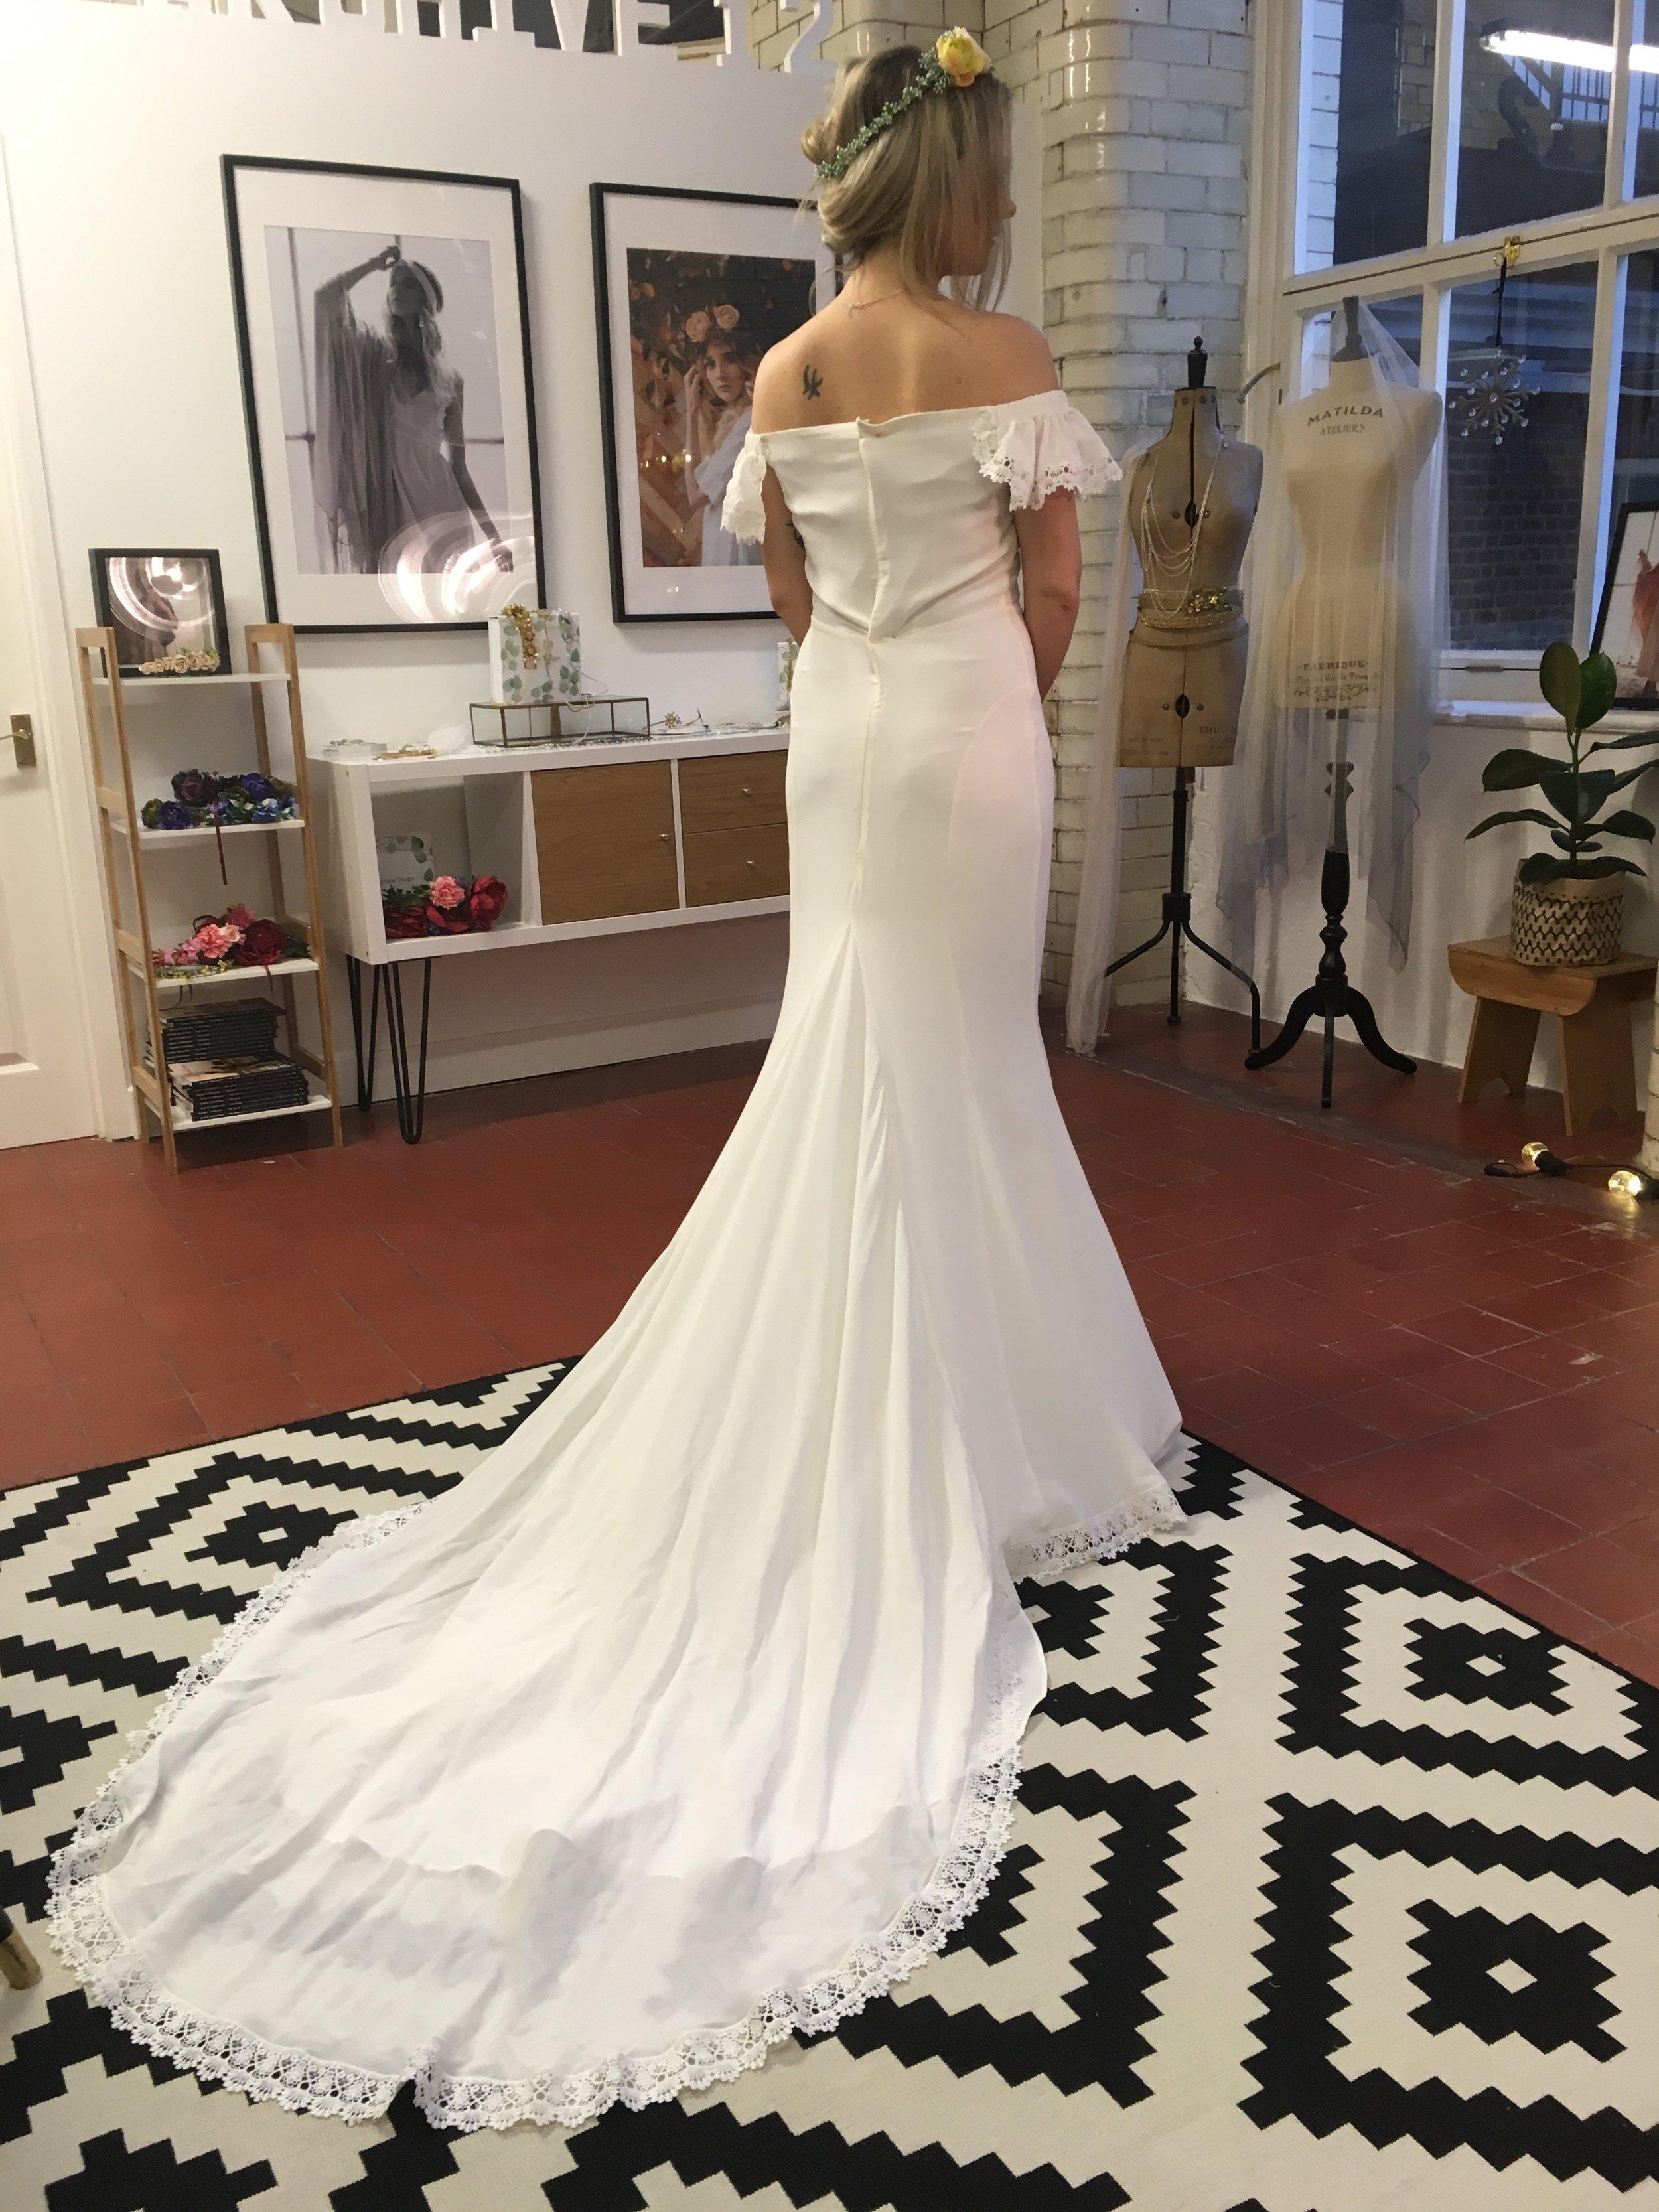 anti bride wedding dress shopping Archive 12